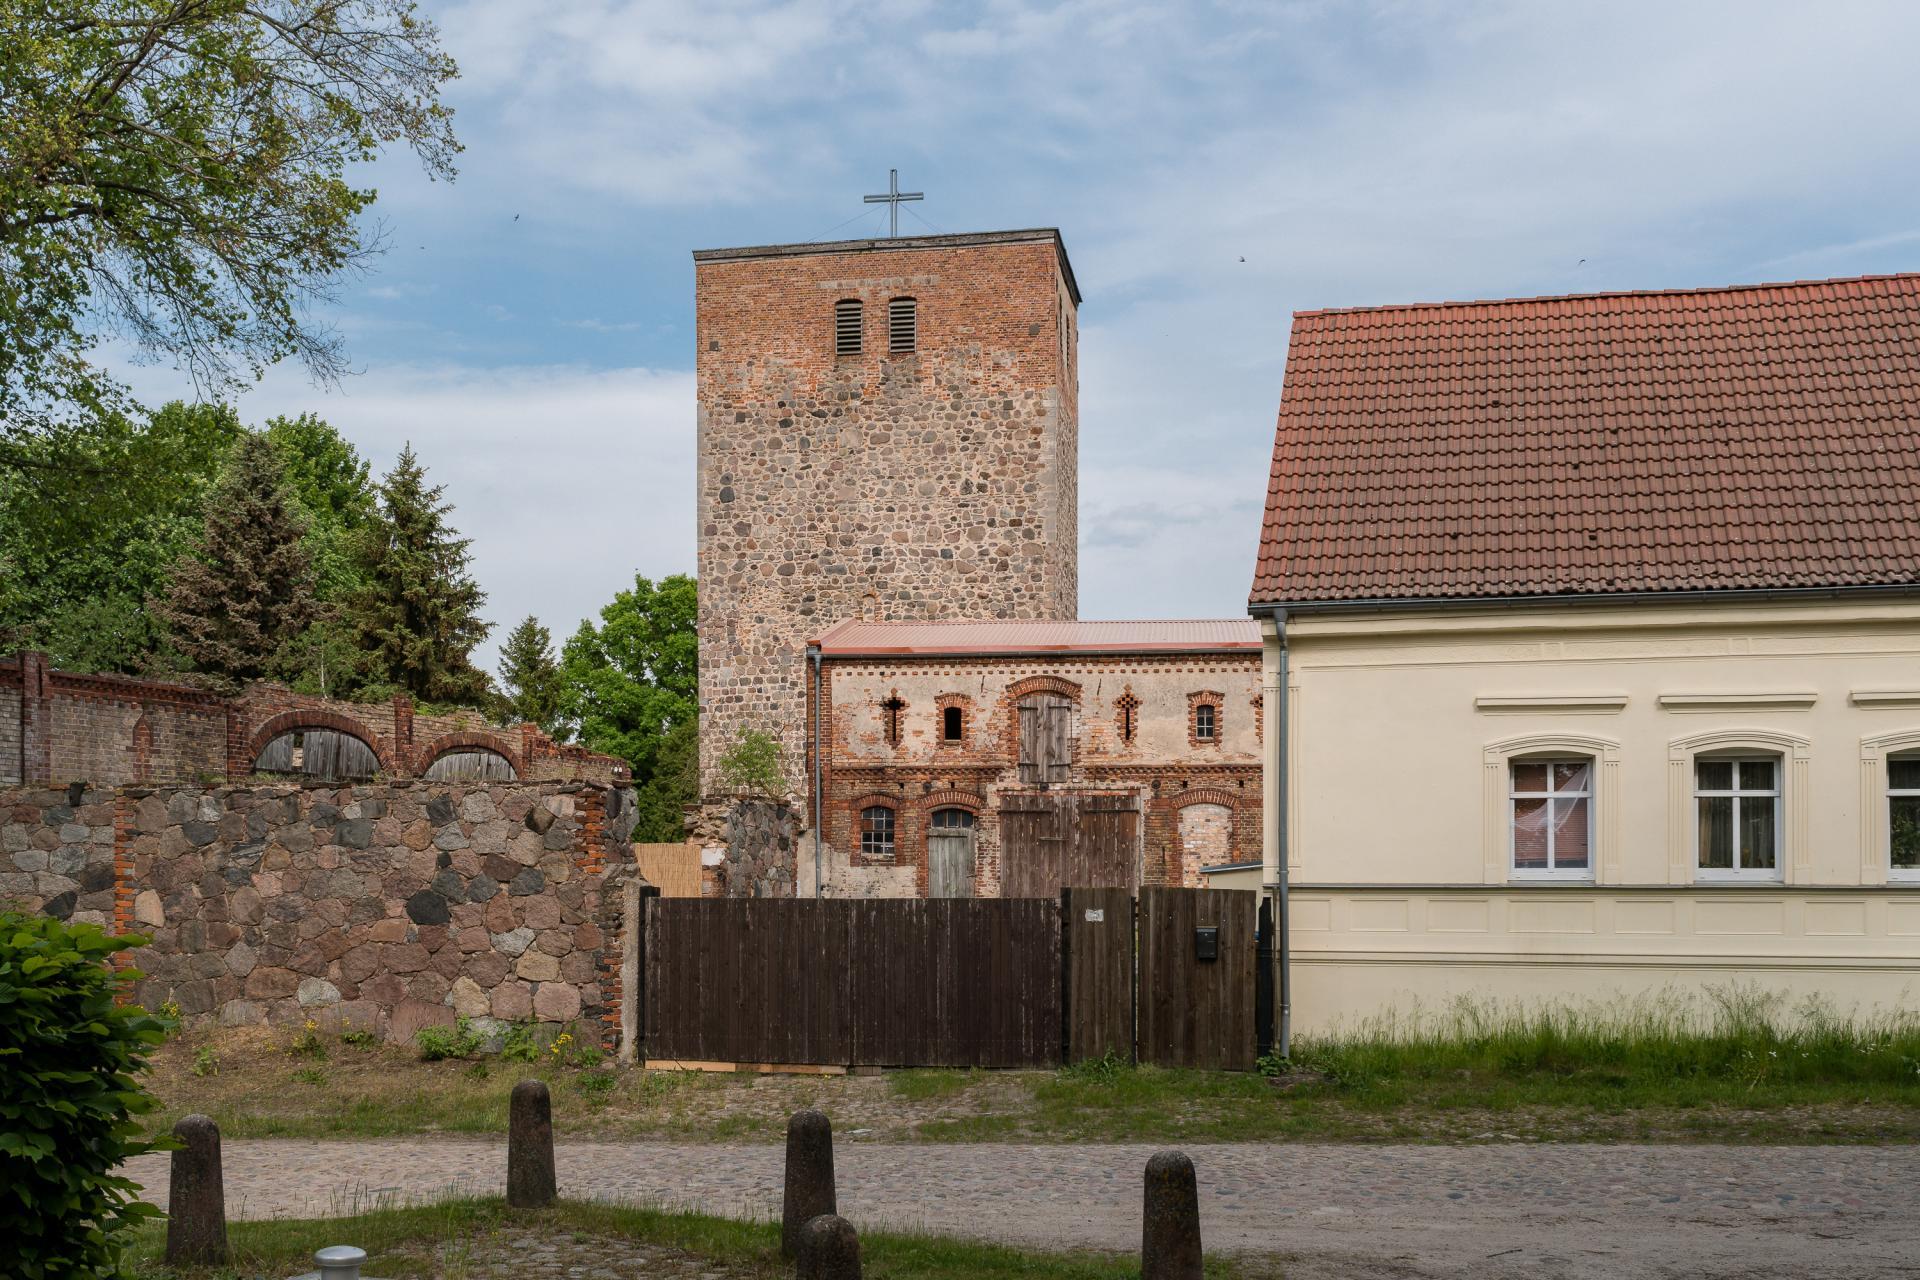 Beiersdorf Kirche